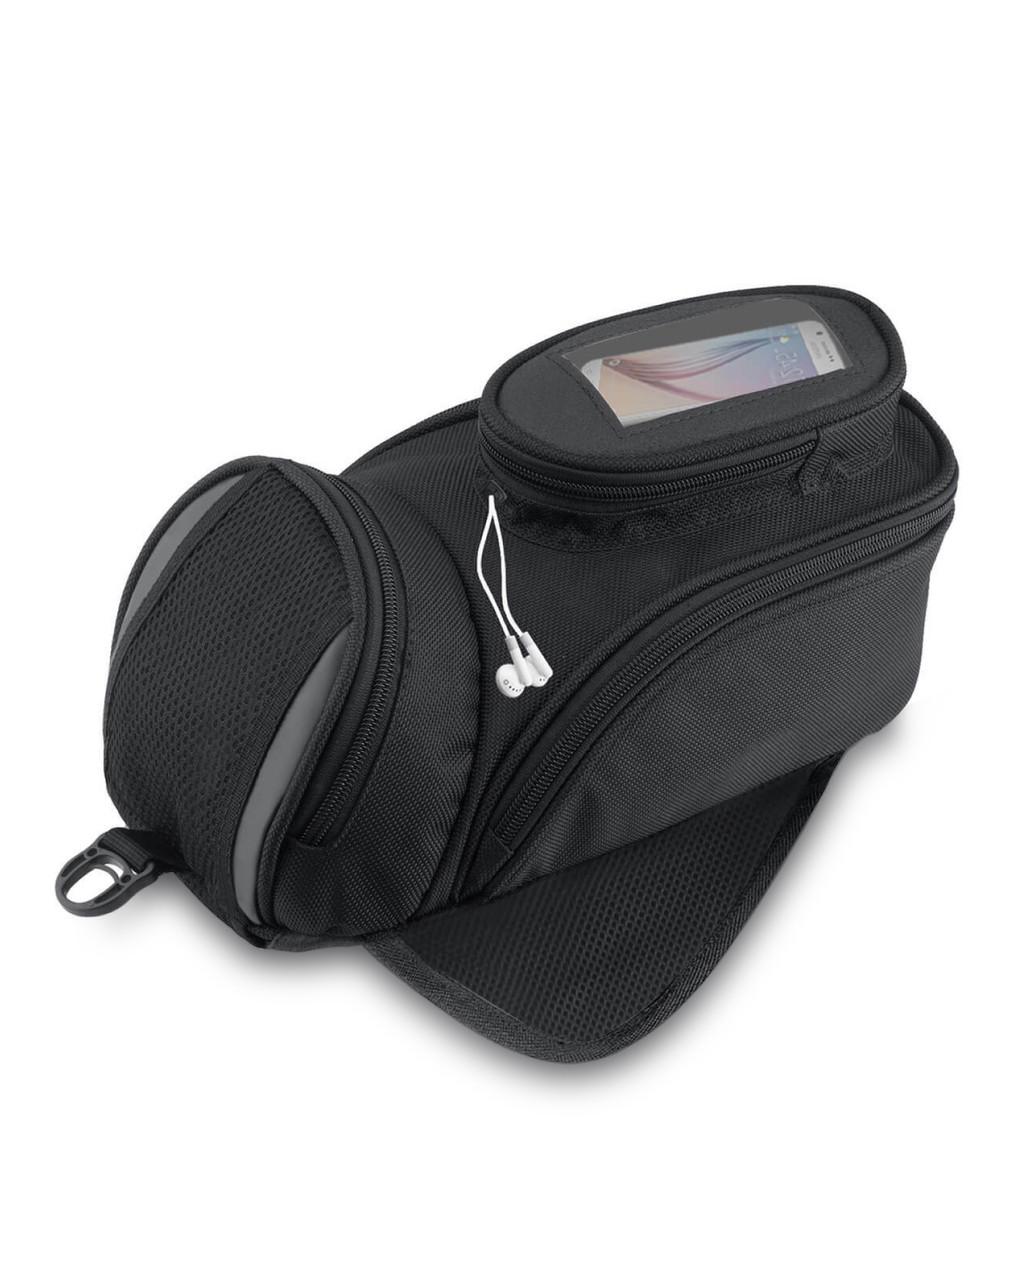 VikingBags Survival Series Victory Magnetic Motorcycle Tank Bag Main Bag View